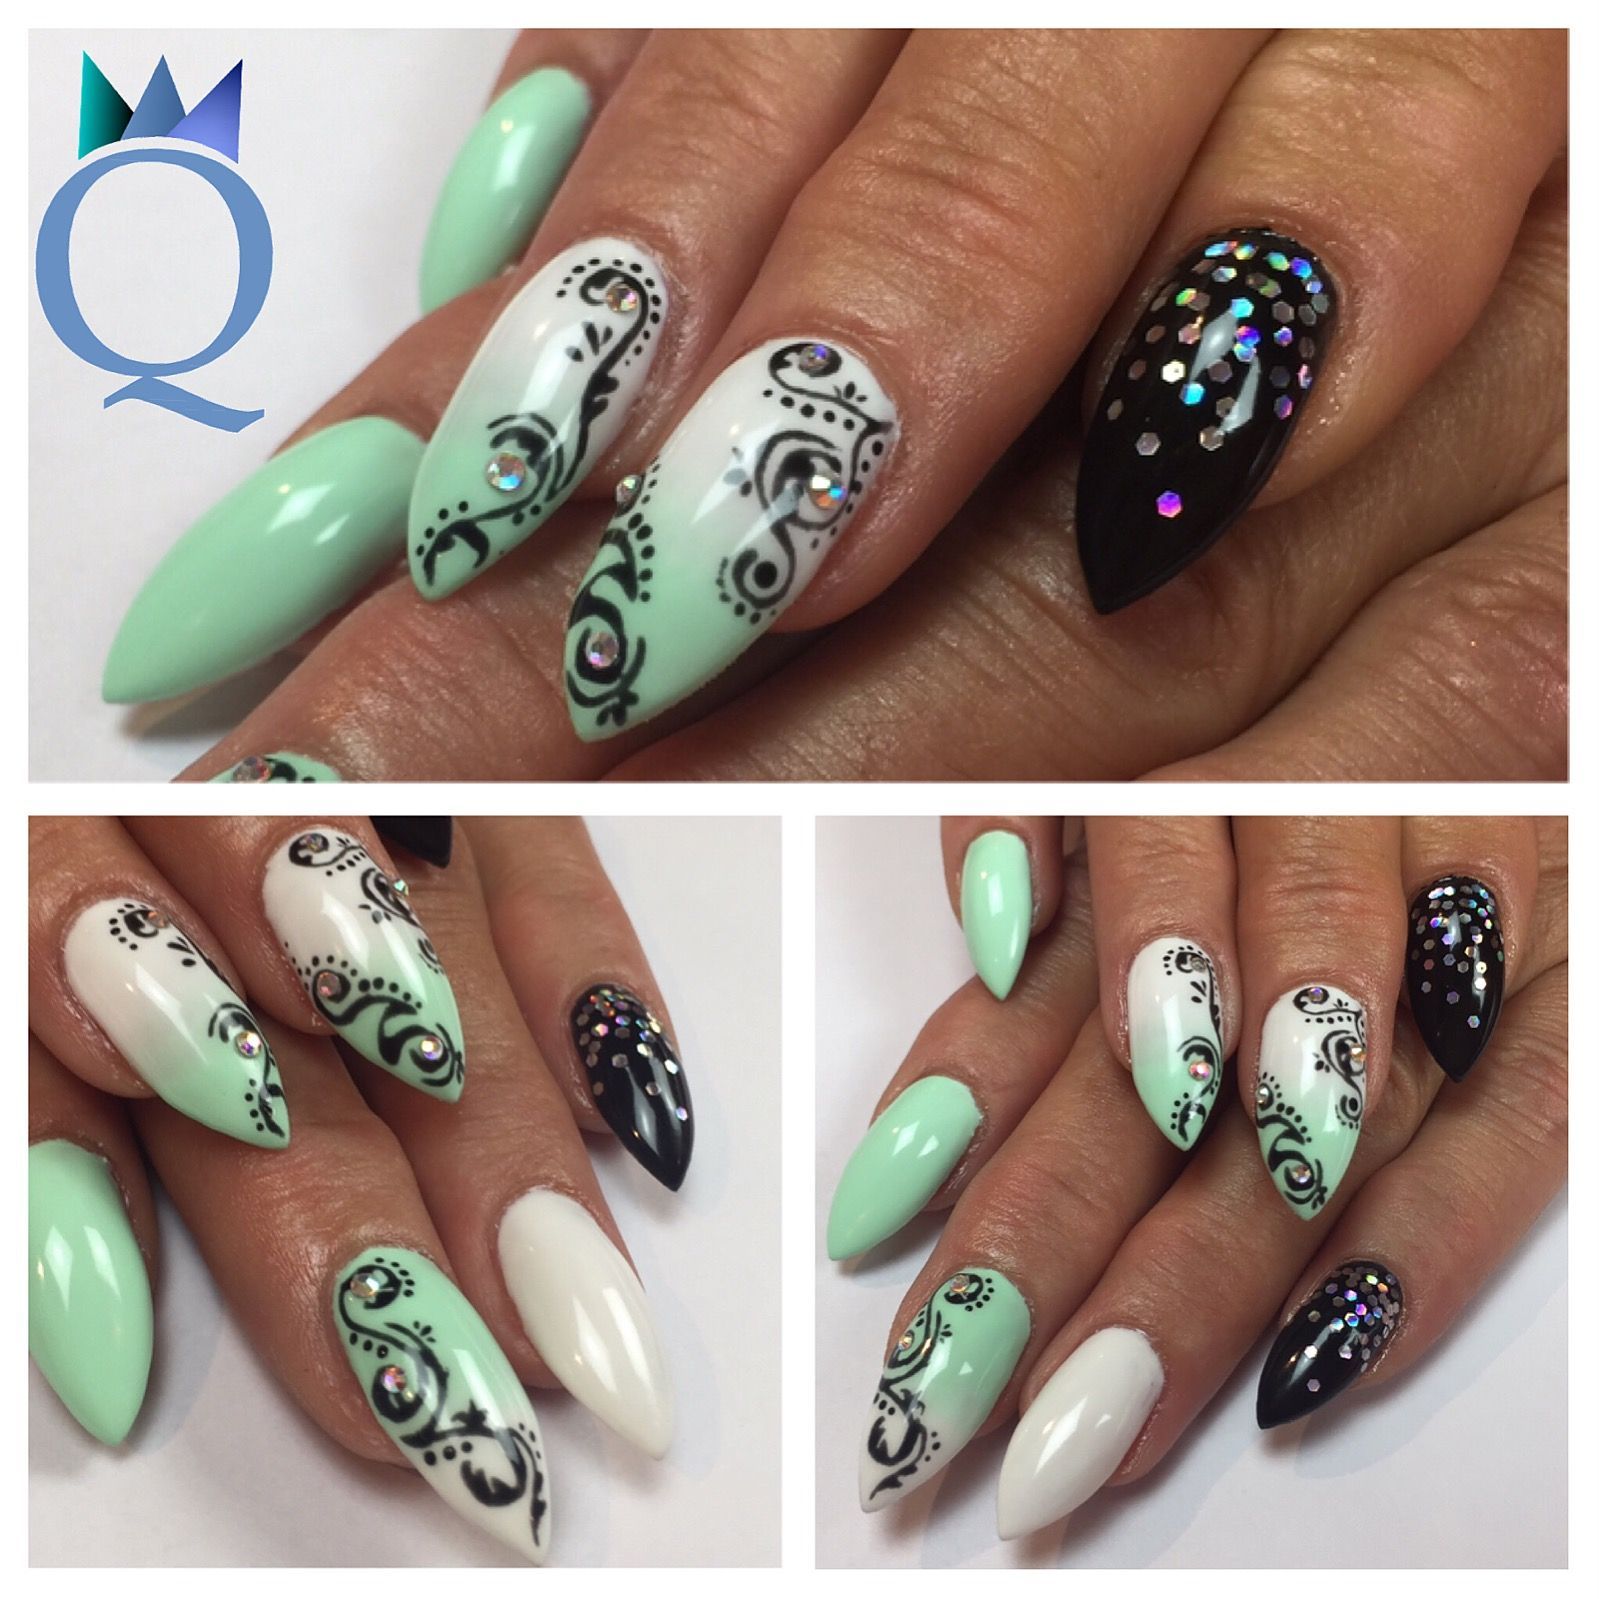 stilettonails #gelnails #nails #mintgreen #white #ombre #black ...